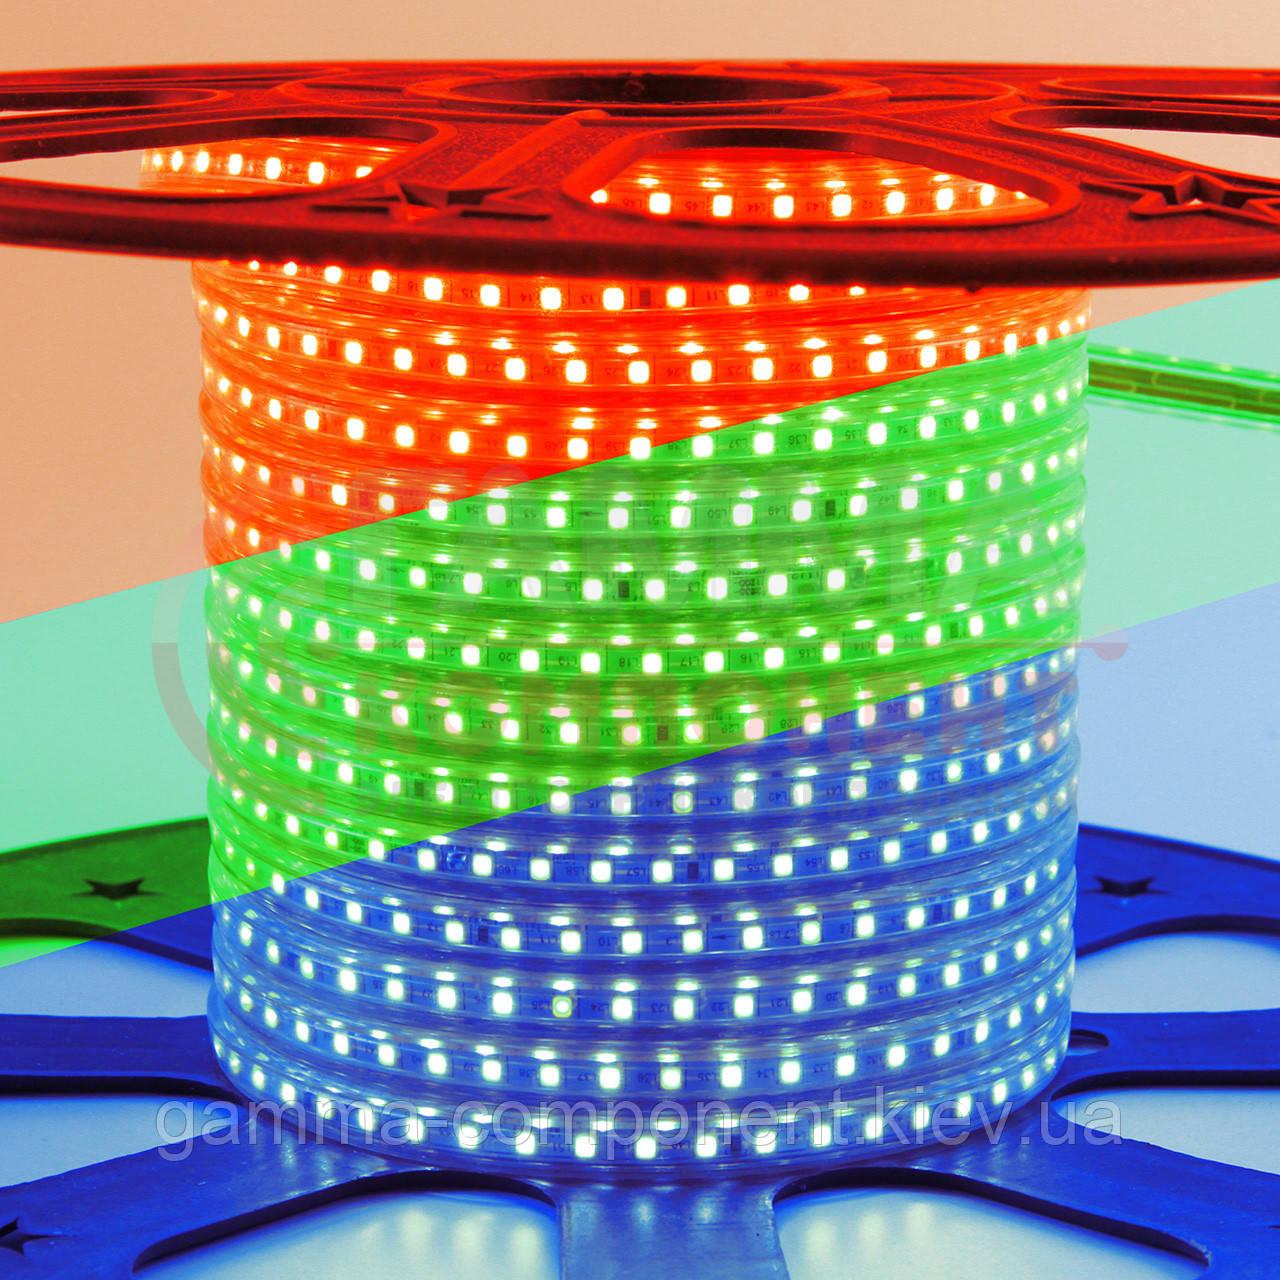 Светодиодная лента 220В RGB AVT smd 5050-60 лед/м 10 Вт/м, герметичная. Бухта 50 метров.